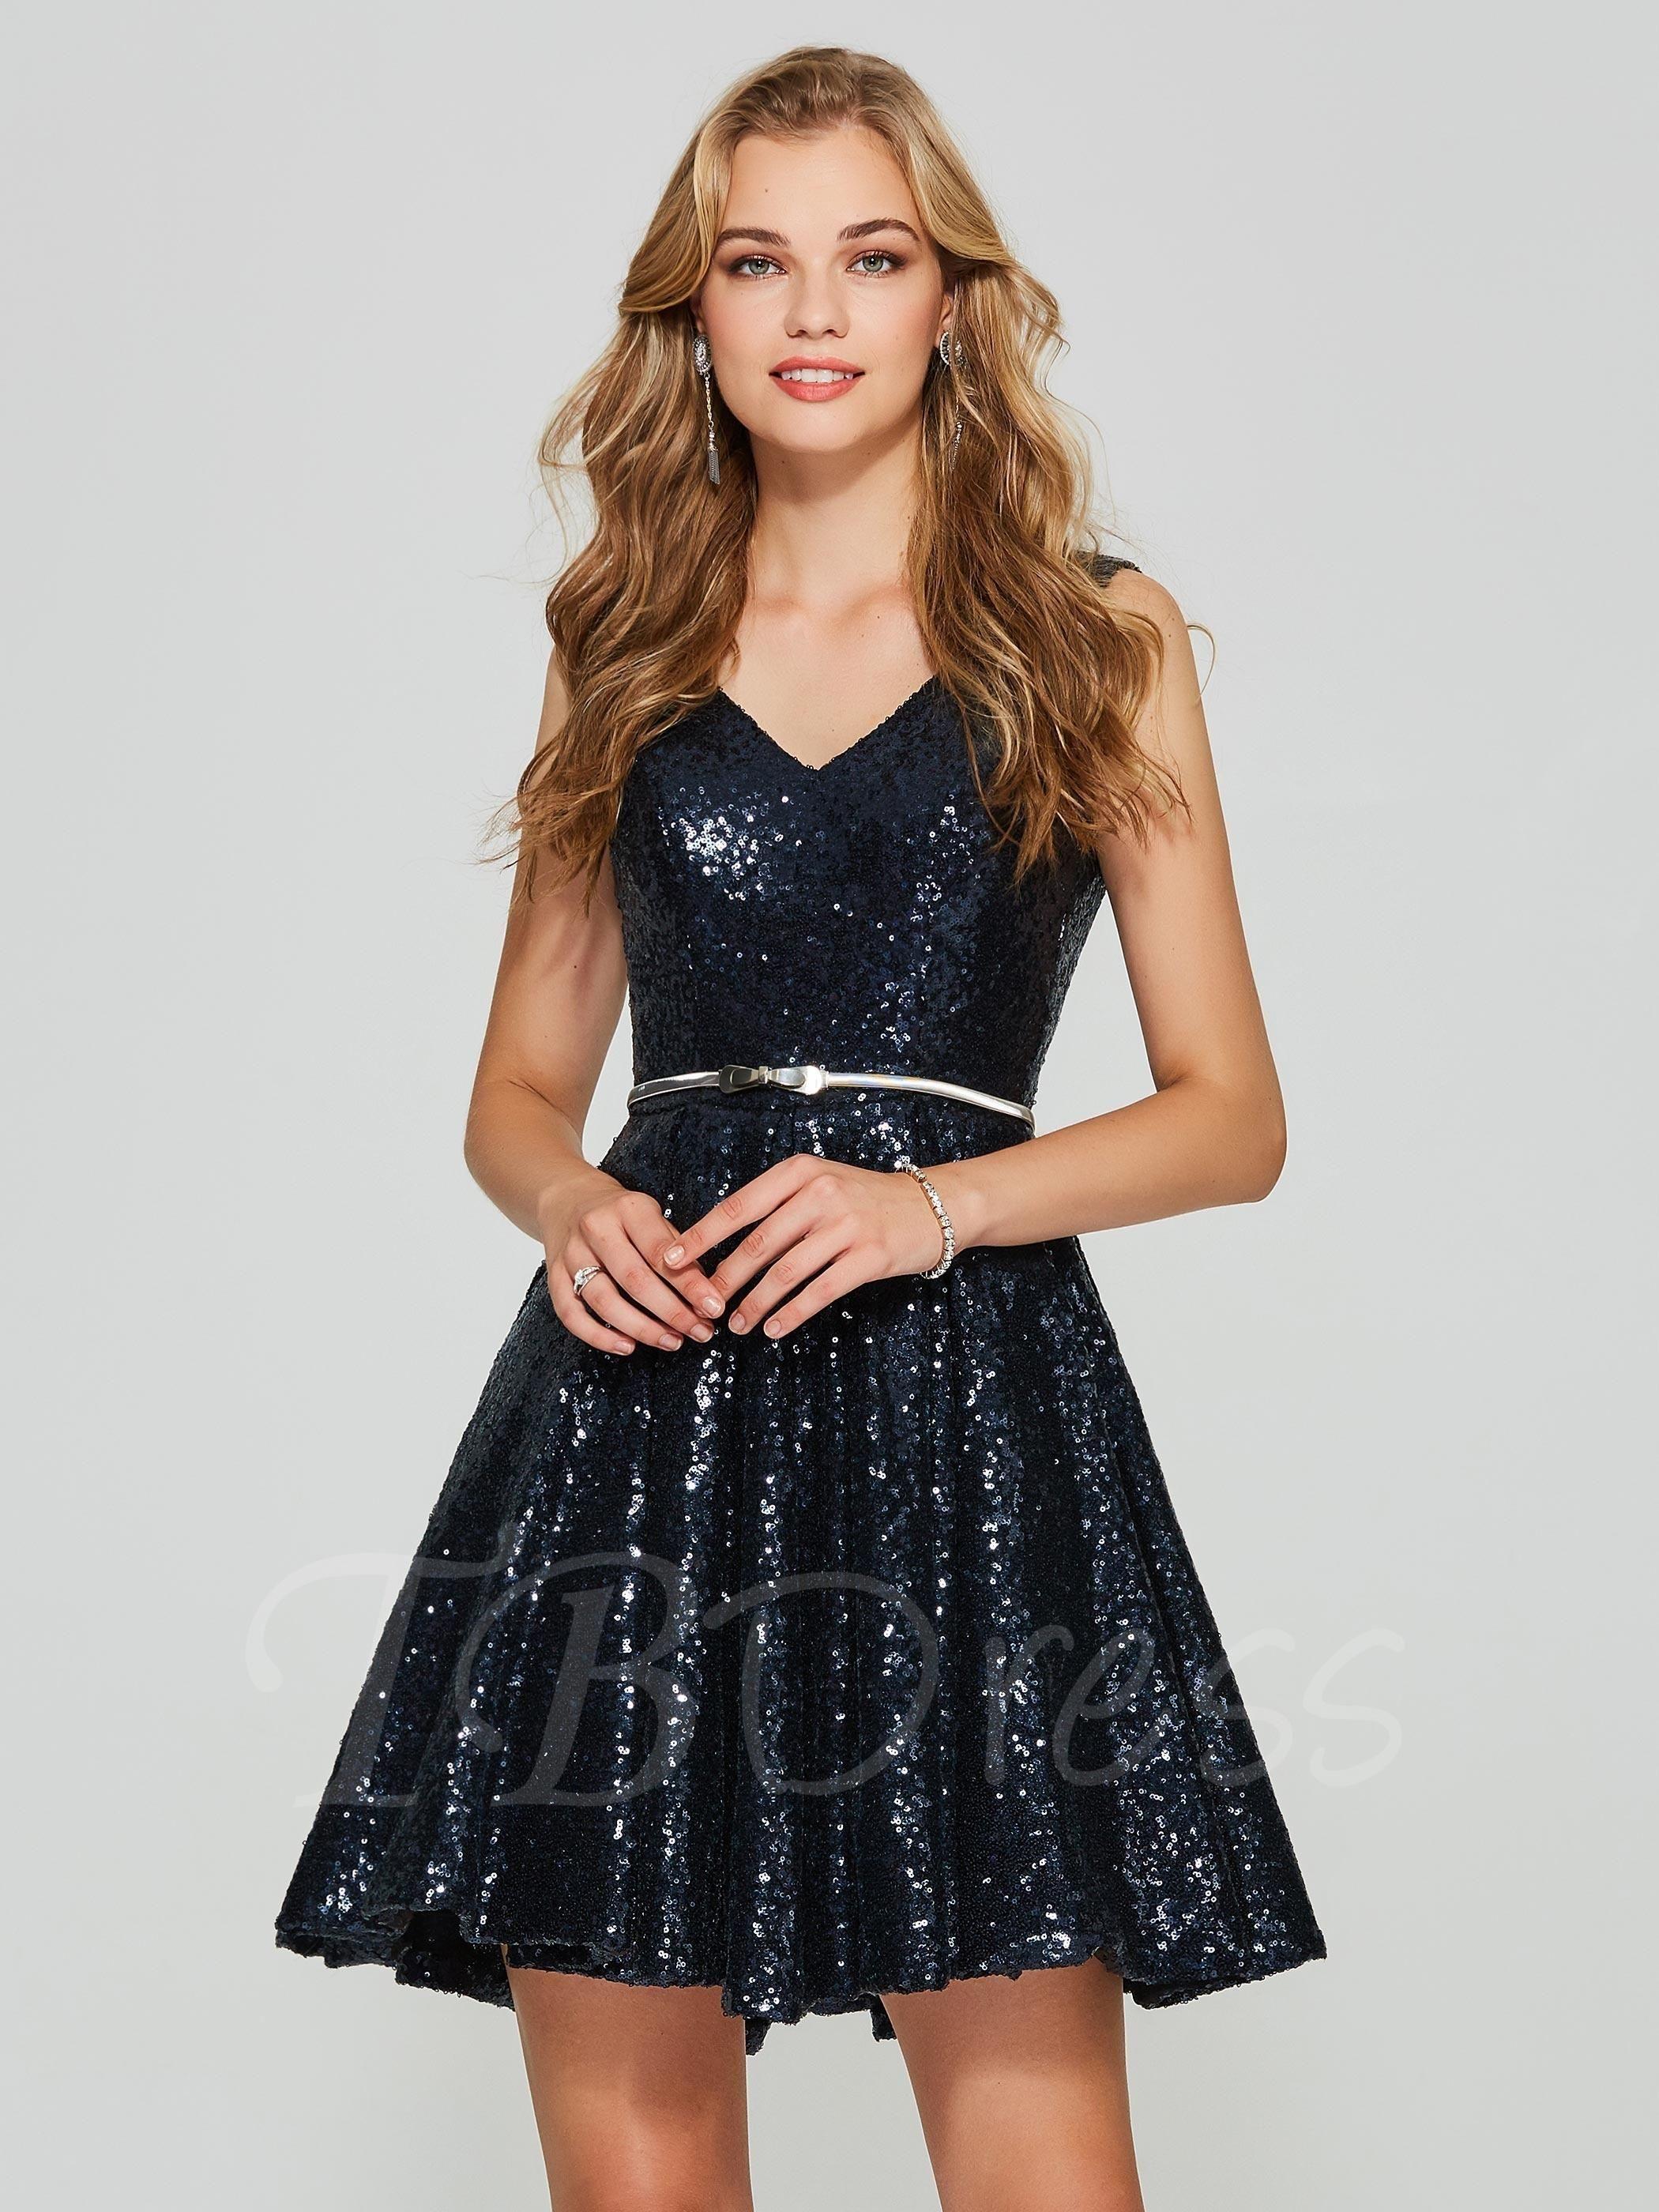 Aline vneck sequins sleeveless short homecoming dress short